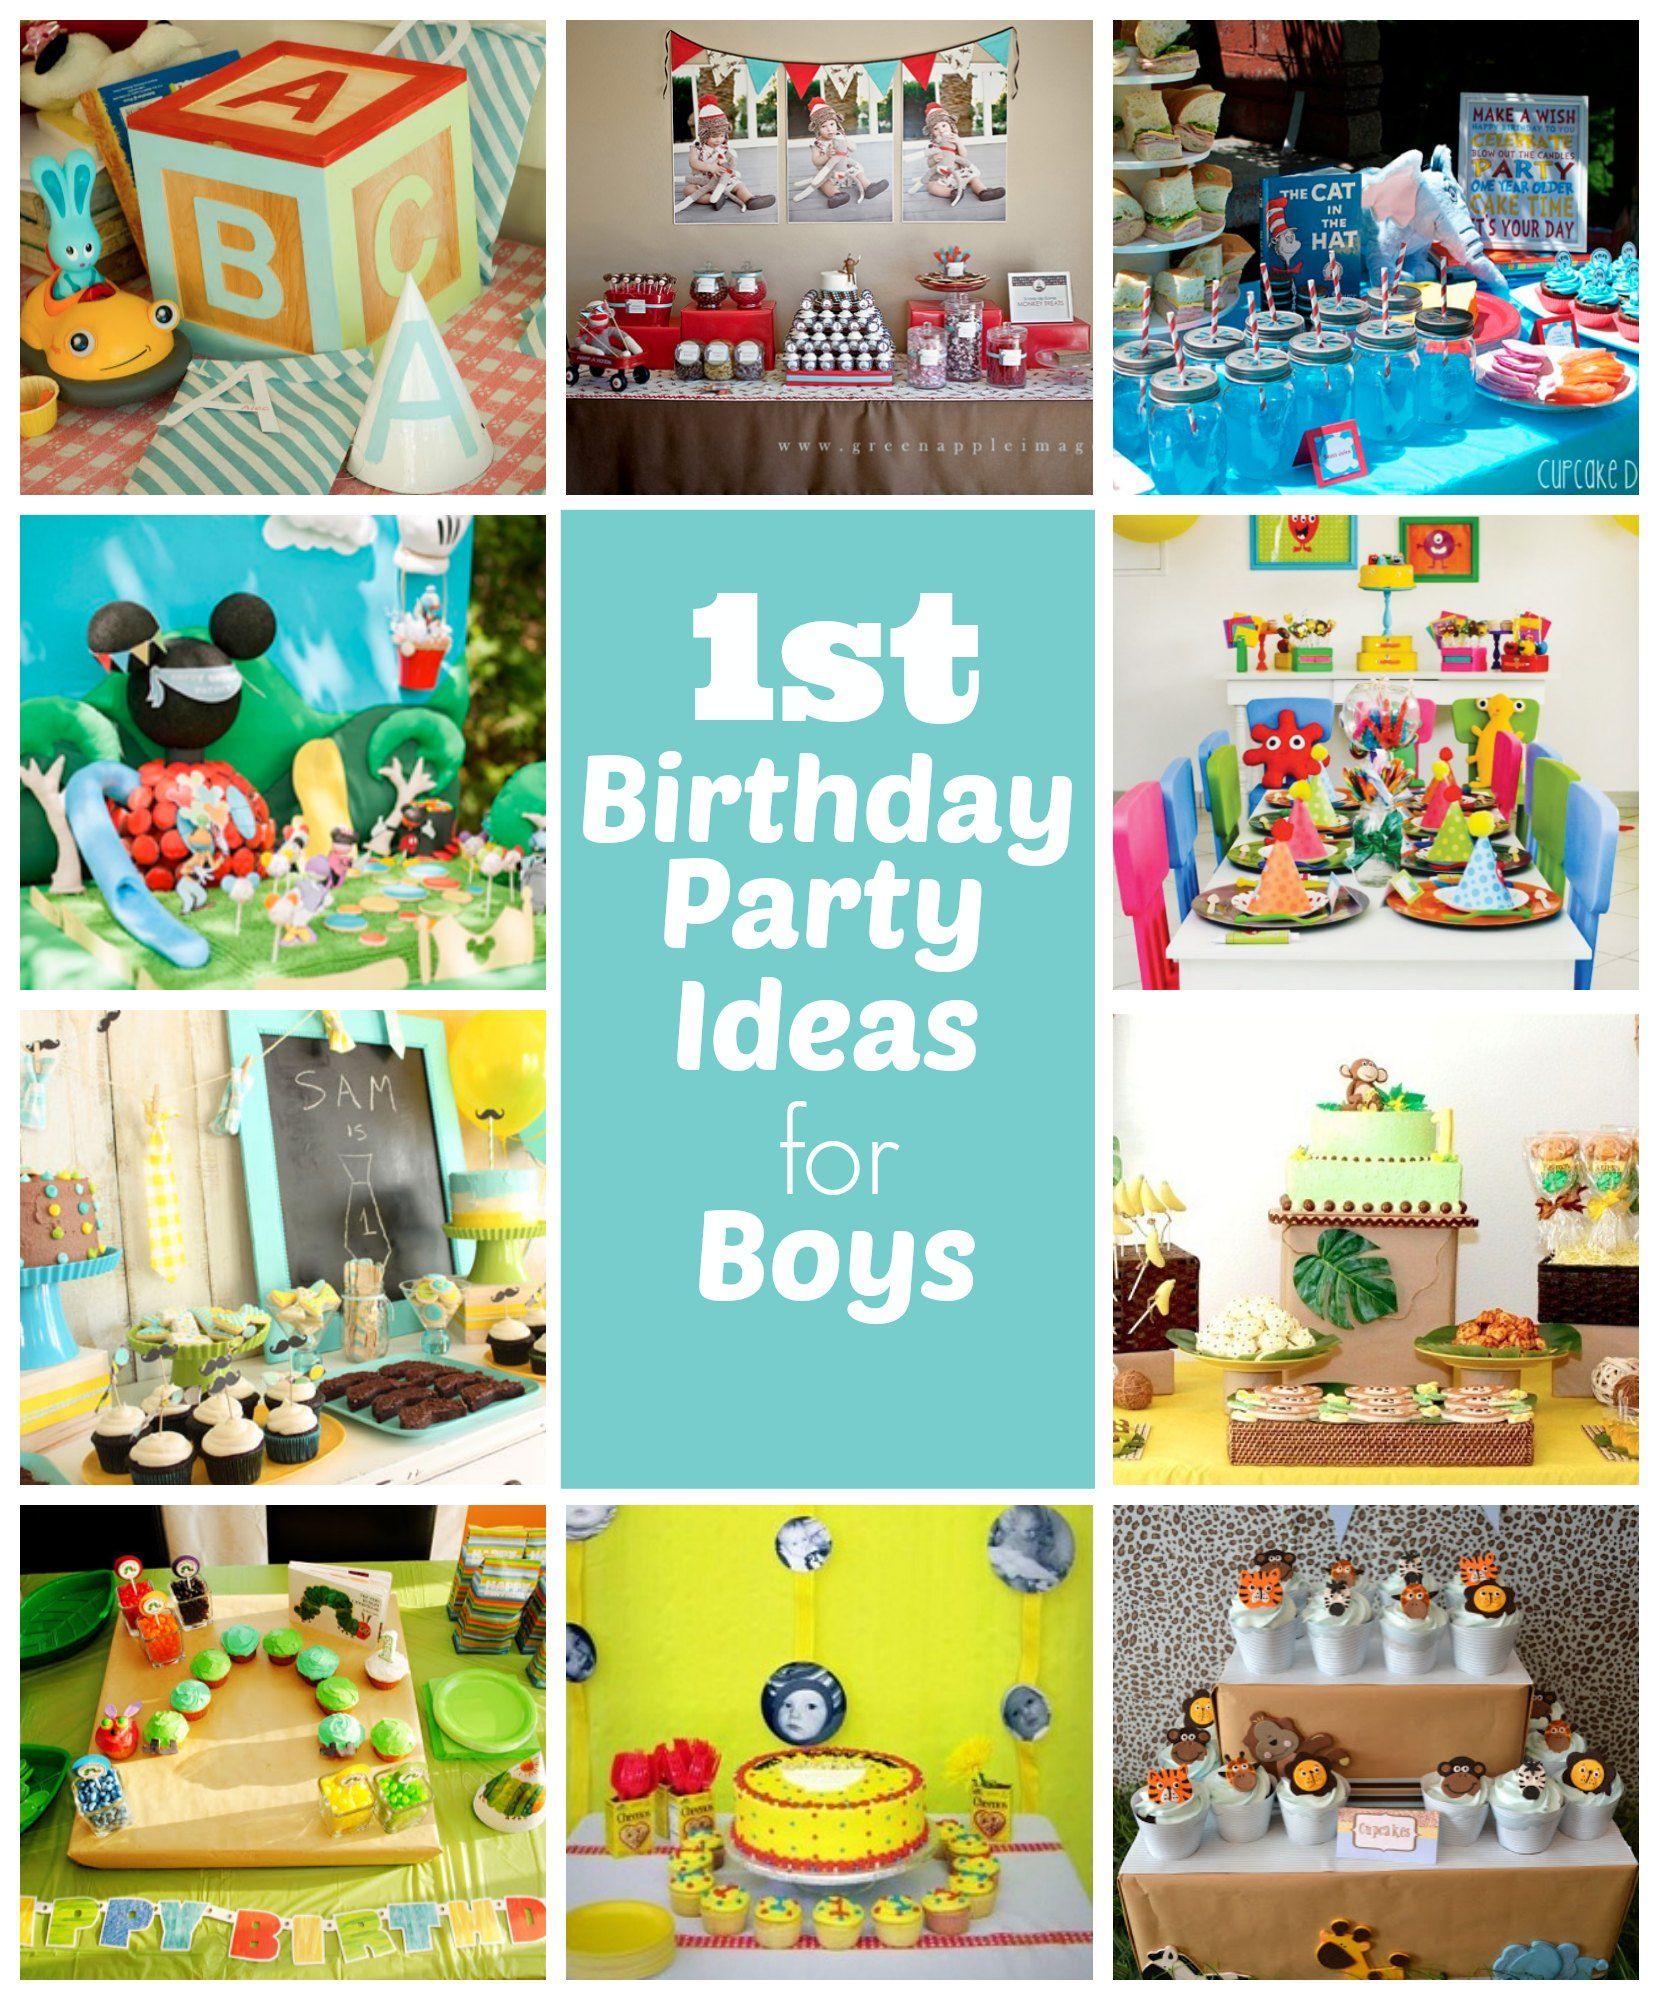 1st Birthday Party Ideas for Boys - Great ideas including ...